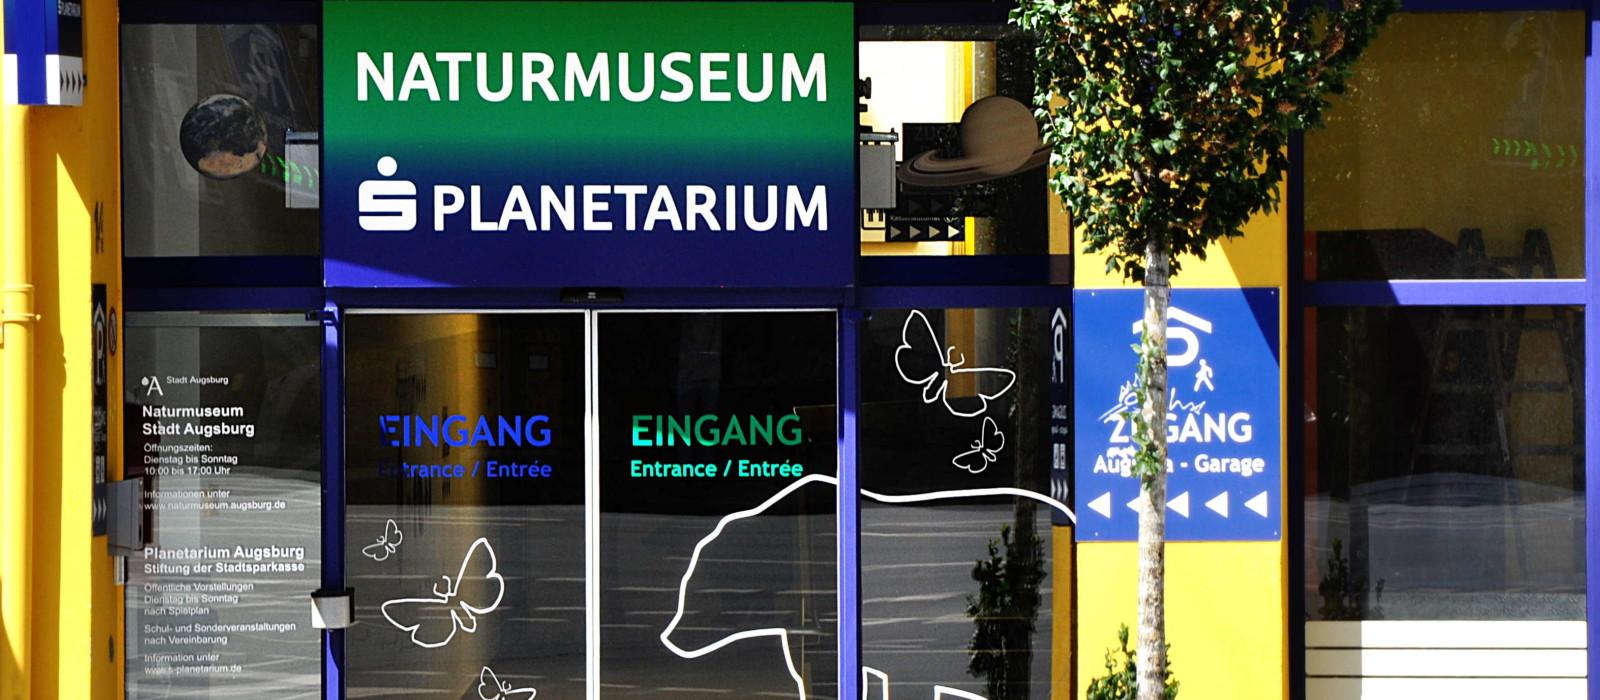 Eingangsbereich Naturmuseum Augburg